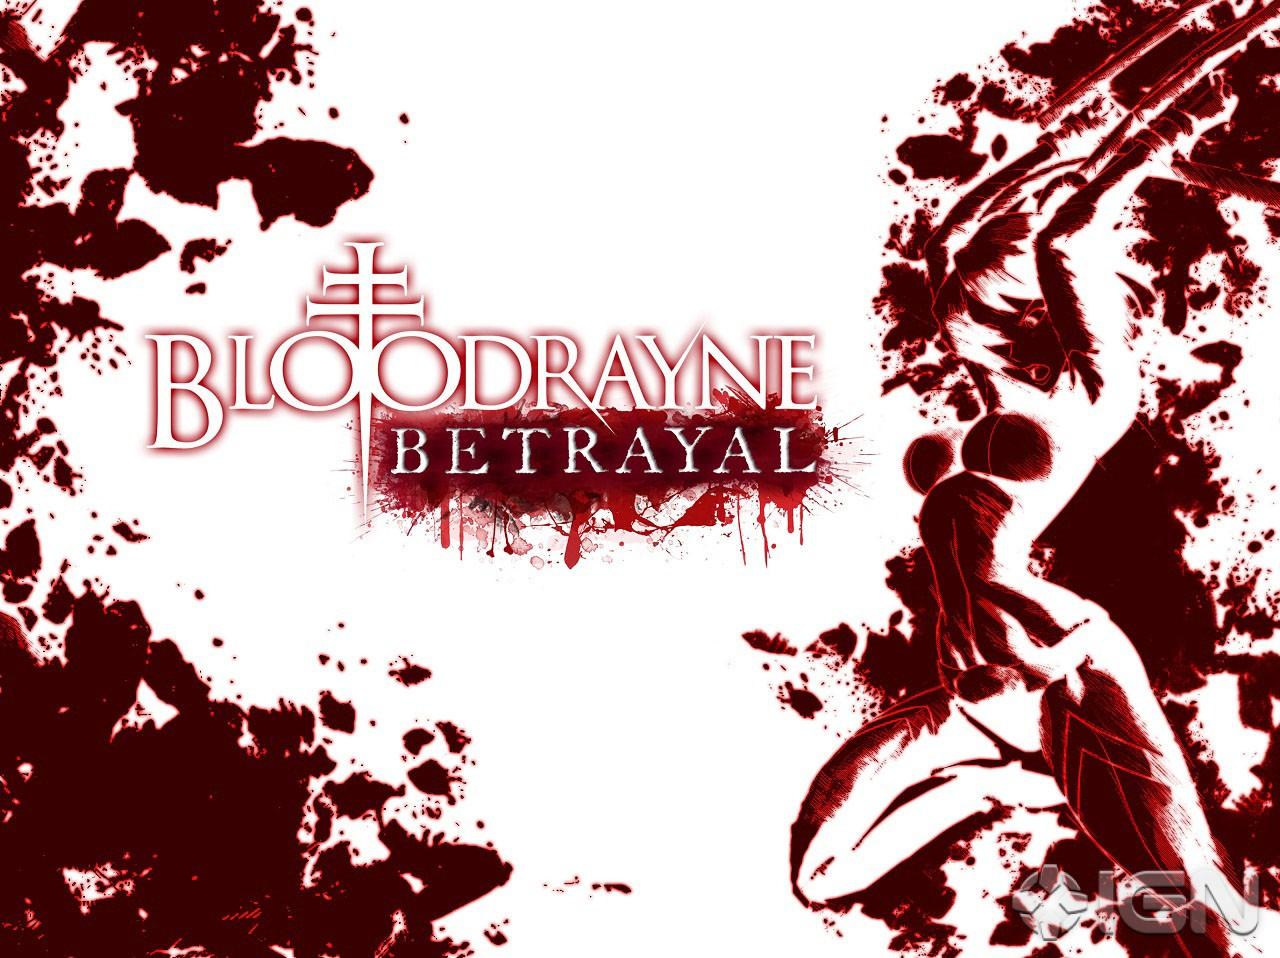 Bloodrayne-betrayal.jpg